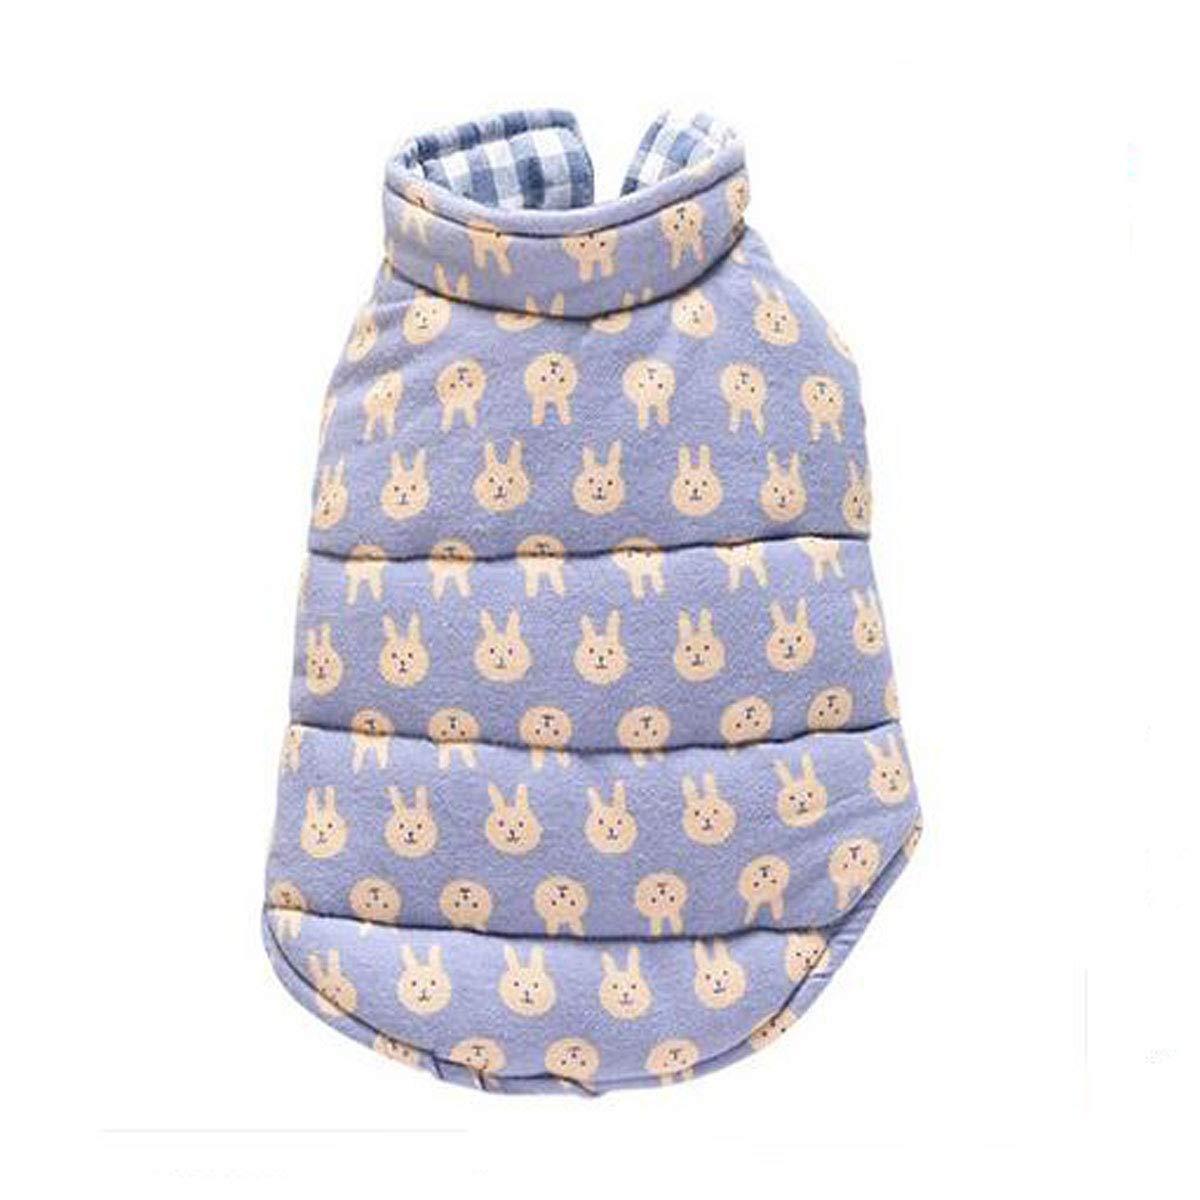 bluee XL bluee XL Pet Teddy Bear, Small Dog Pet Cat, Autumn Cotton Vest (color   bluee, Size   XL)